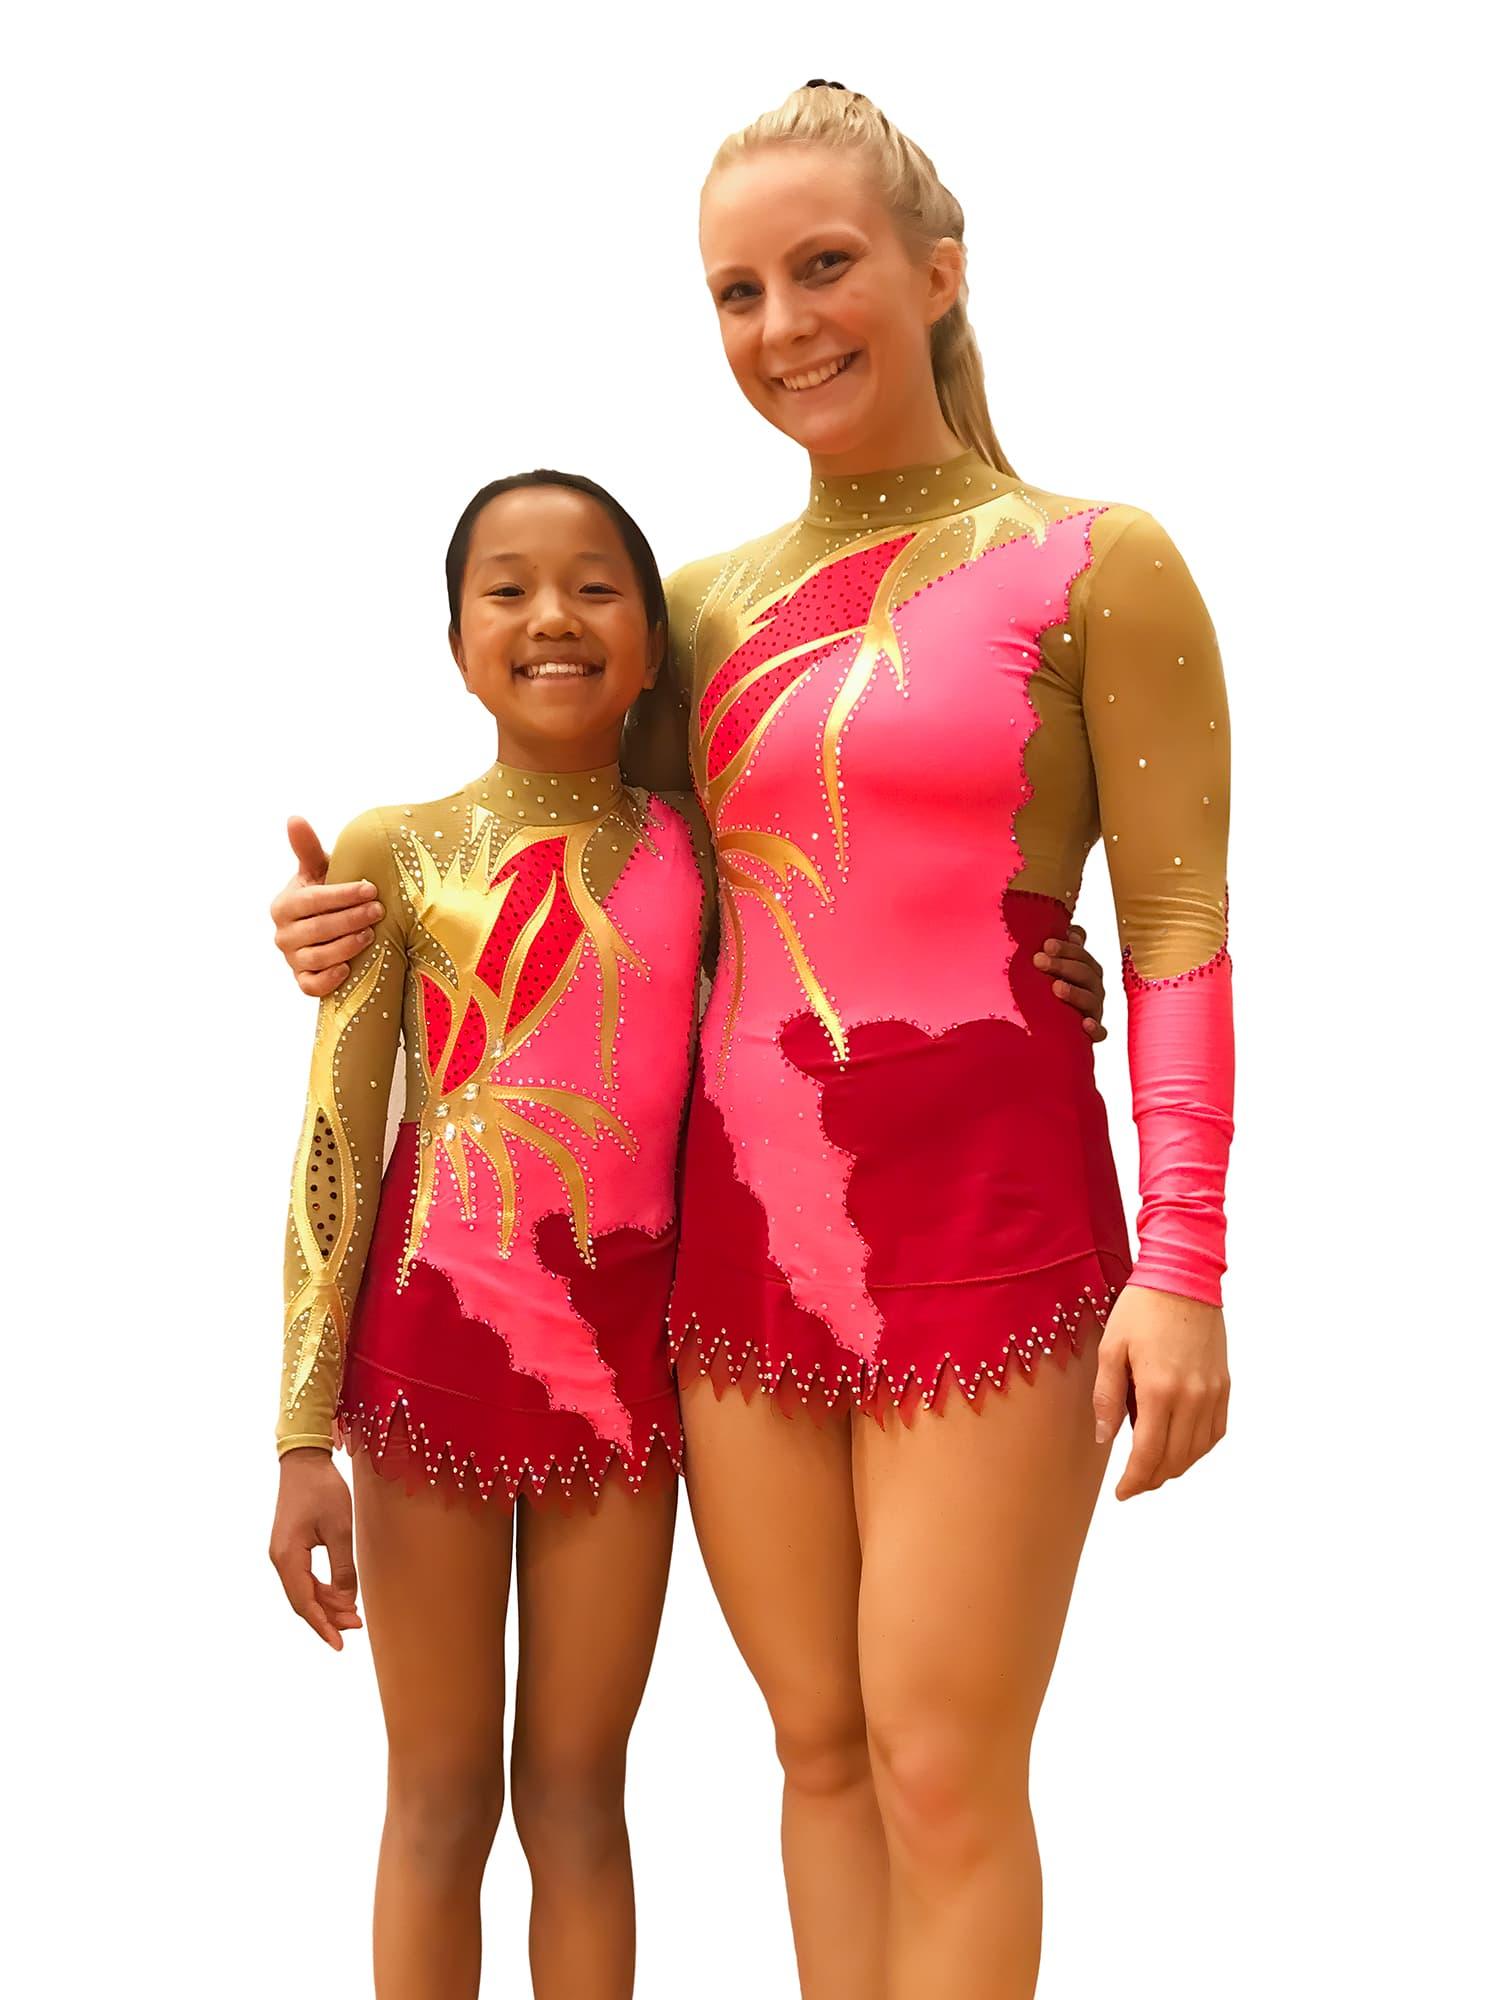 Duo gymnasts at rhythmic gymnastics leotard № 119 for competitions